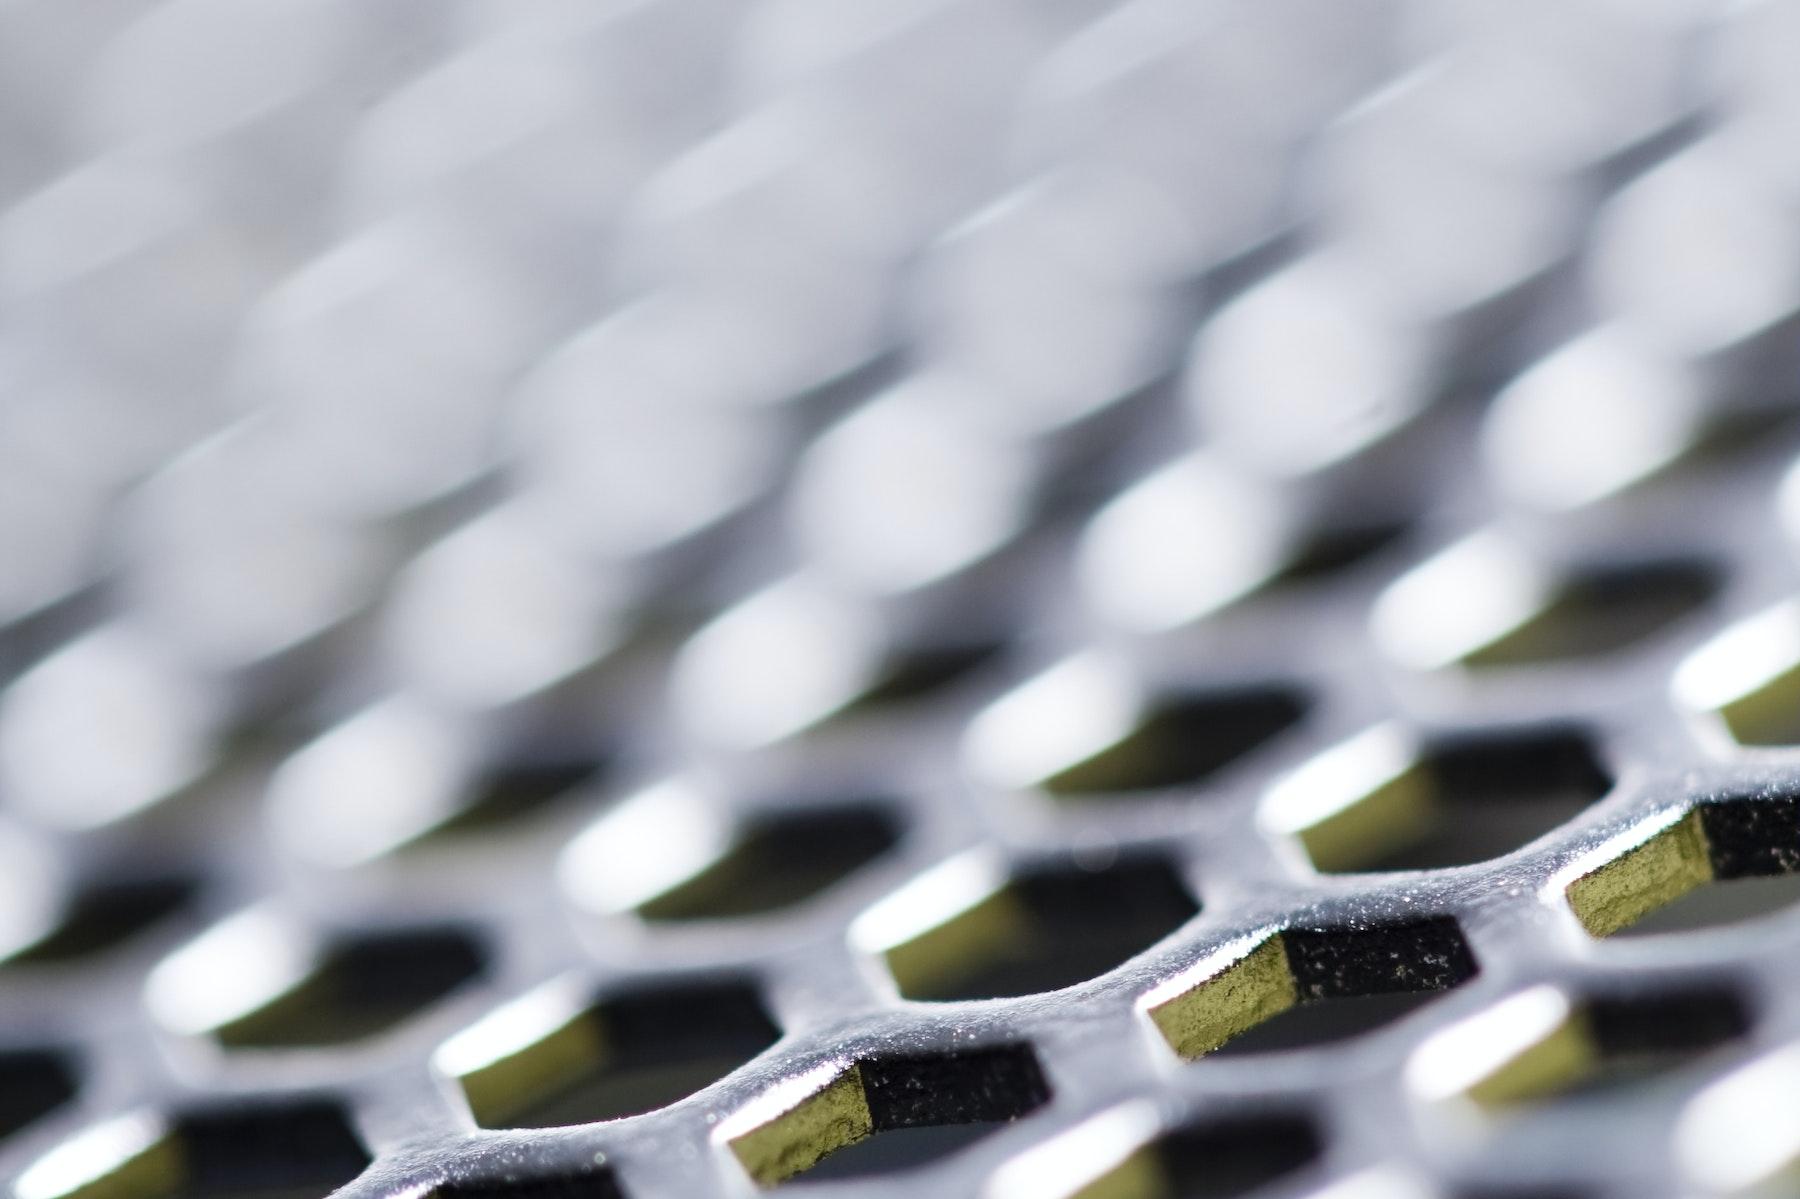 Macro computer grille